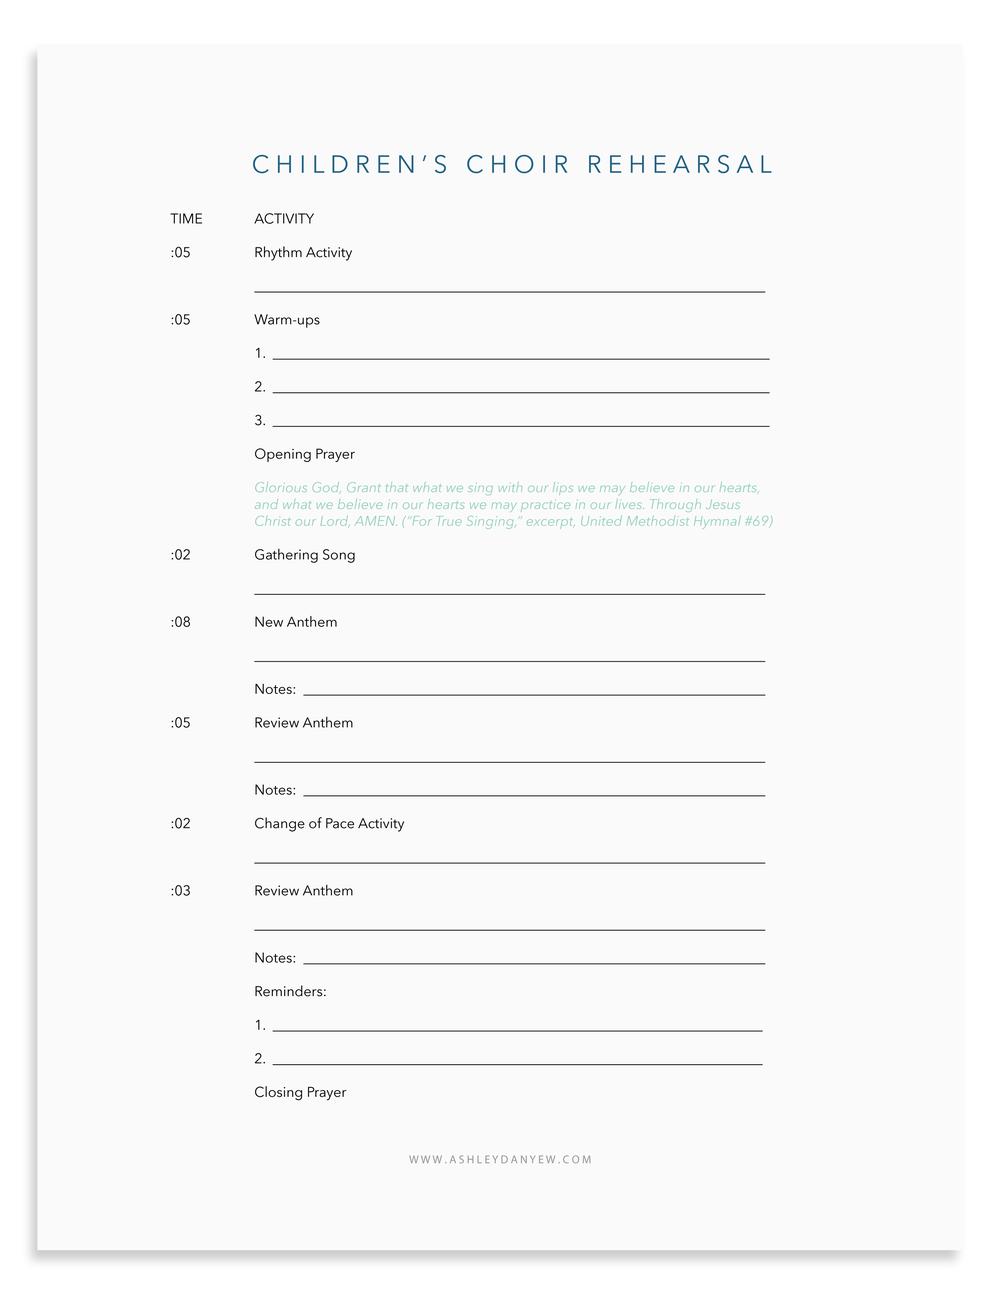 Children's Choir Rehearsal Plan Template.png